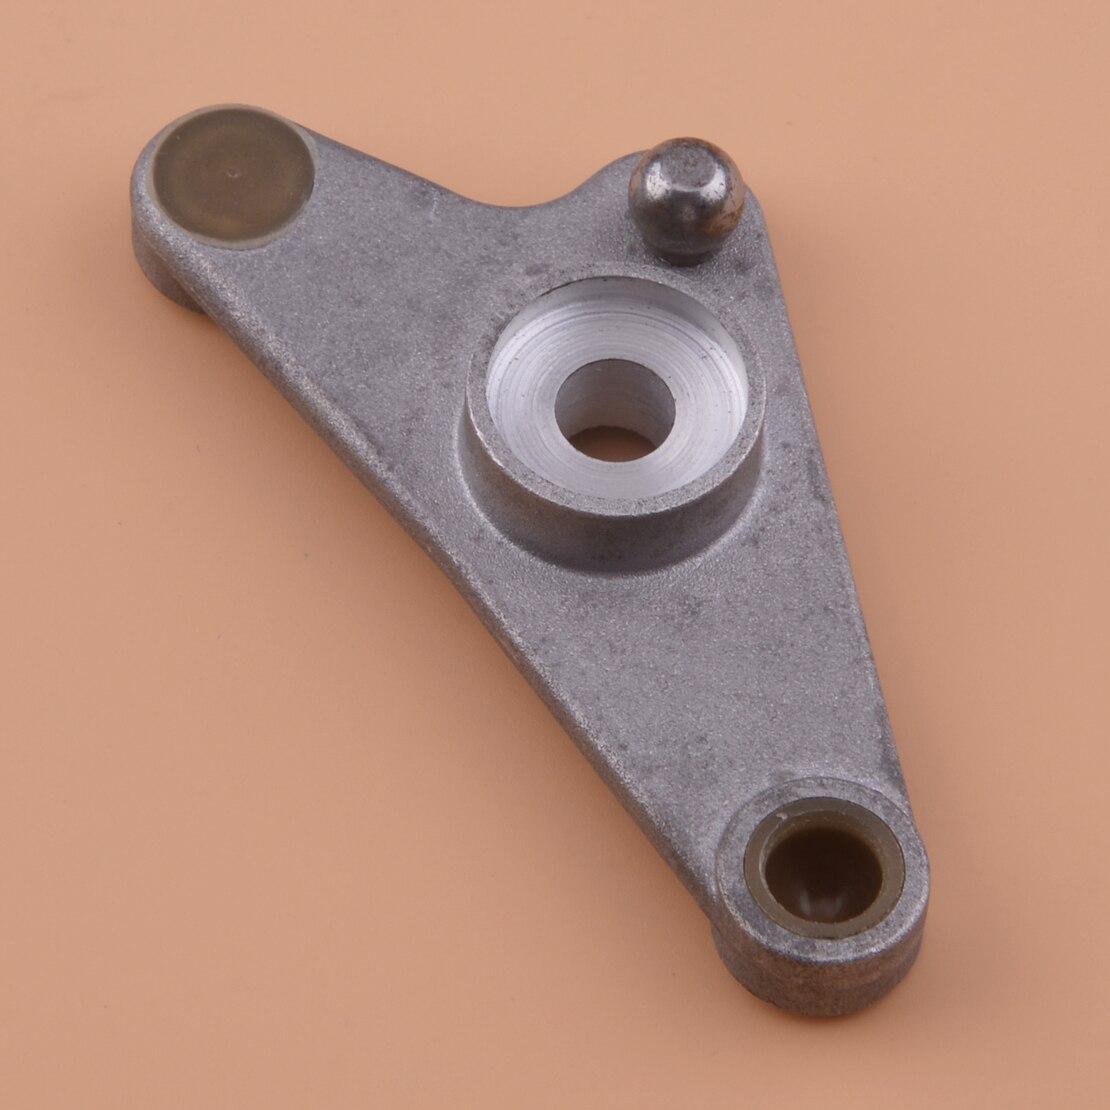 Beler อลูมิเนียม Intake Manifold Air Flap Runner ชุดซ่อมเครื่องมือ Fit สำหรับ Mercedes Benz M272 272 140 24 01